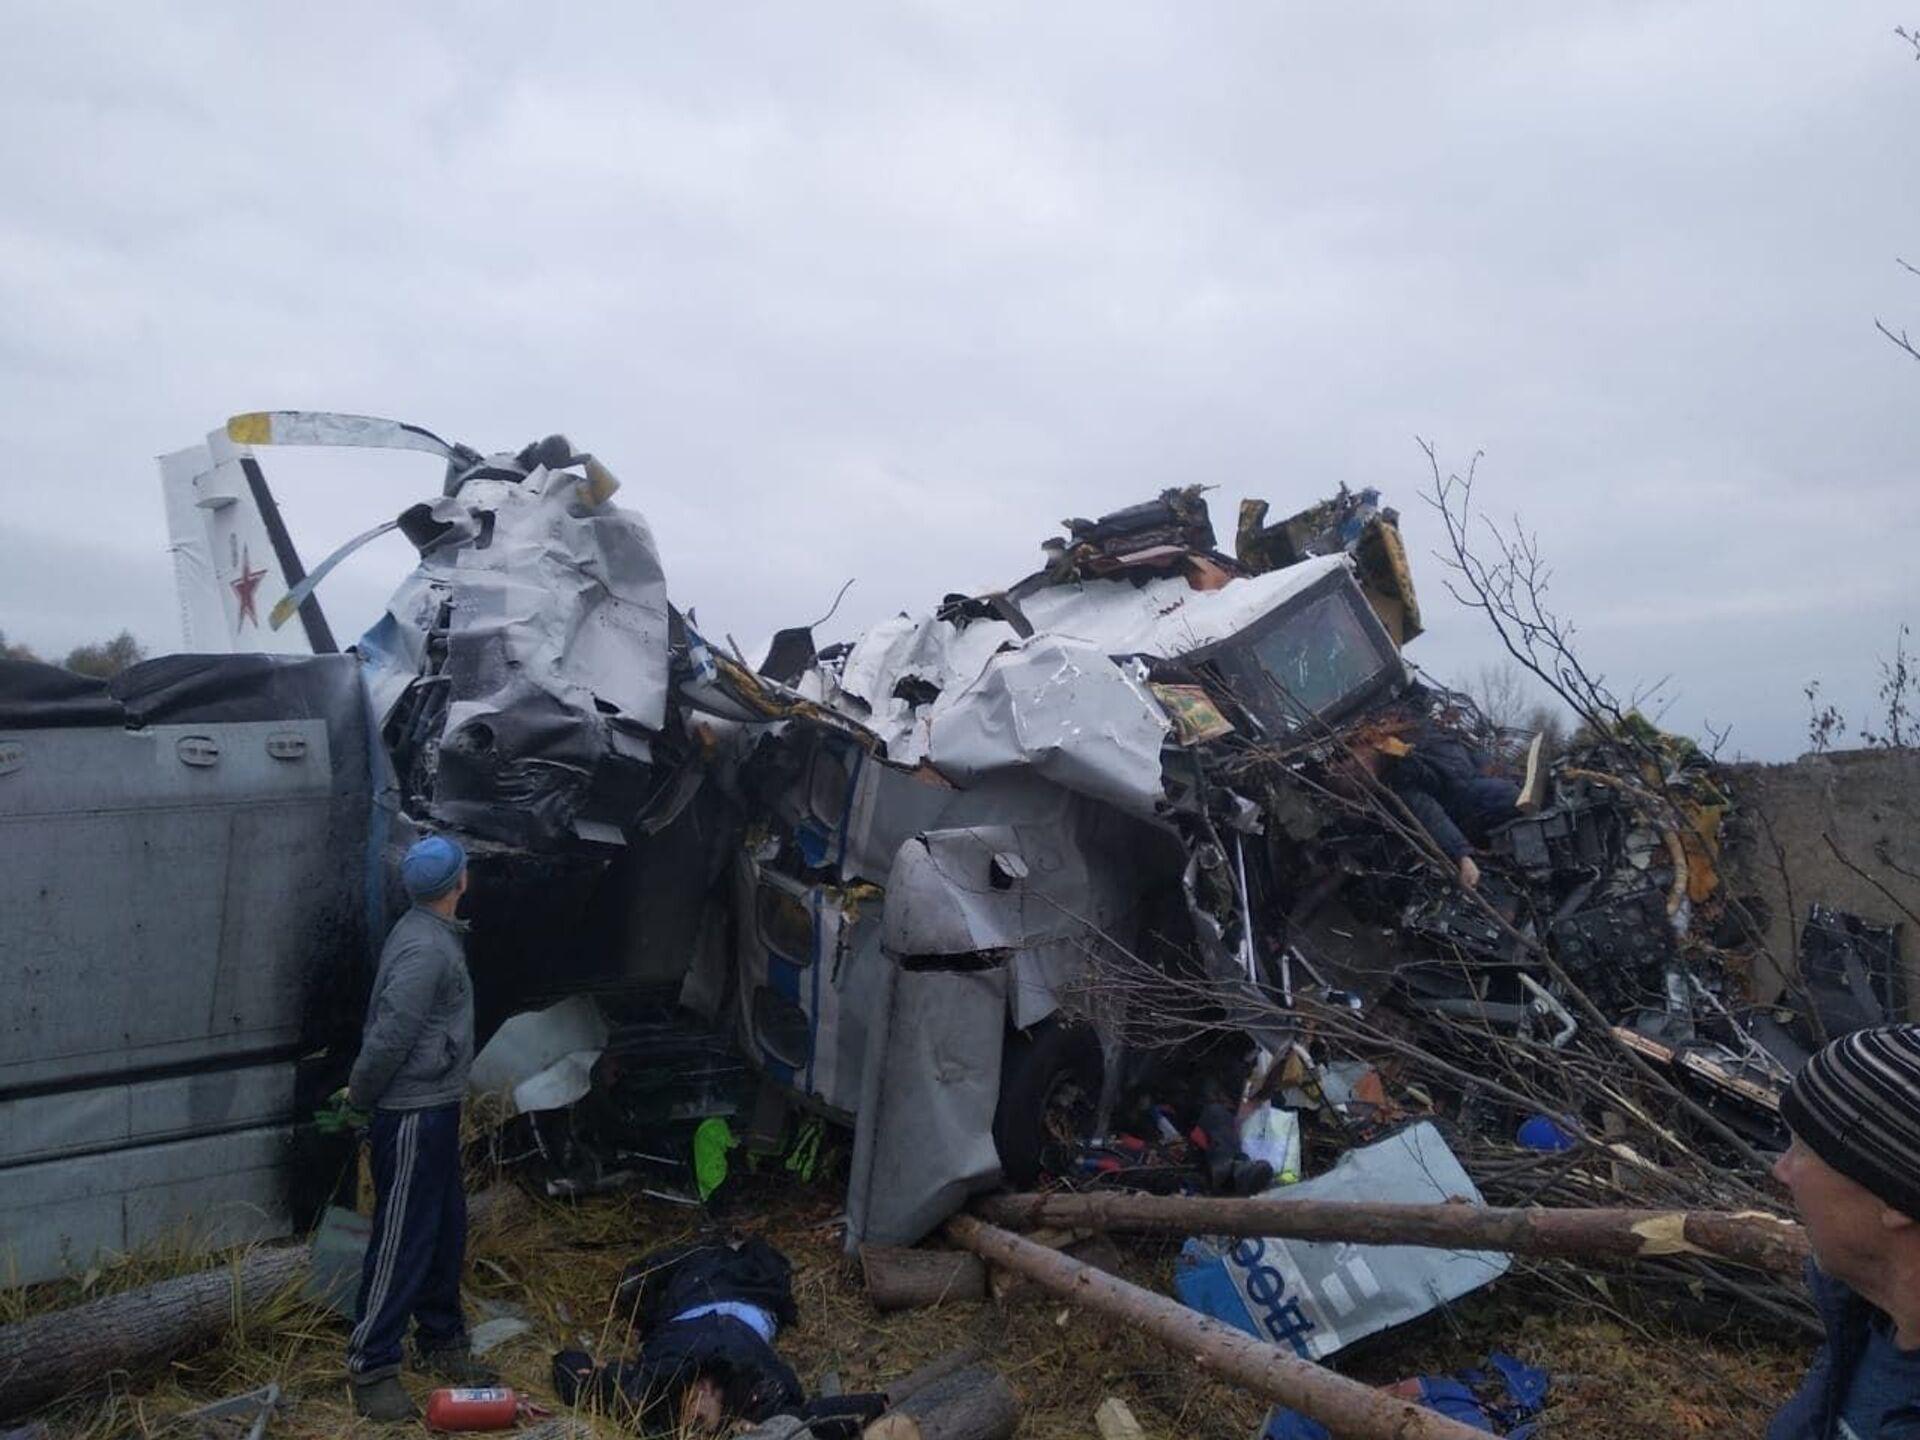 Máy bay L-410 bị rơi ở Tatarstan - Sputnik Việt Nam, 1920, 10.10.2021